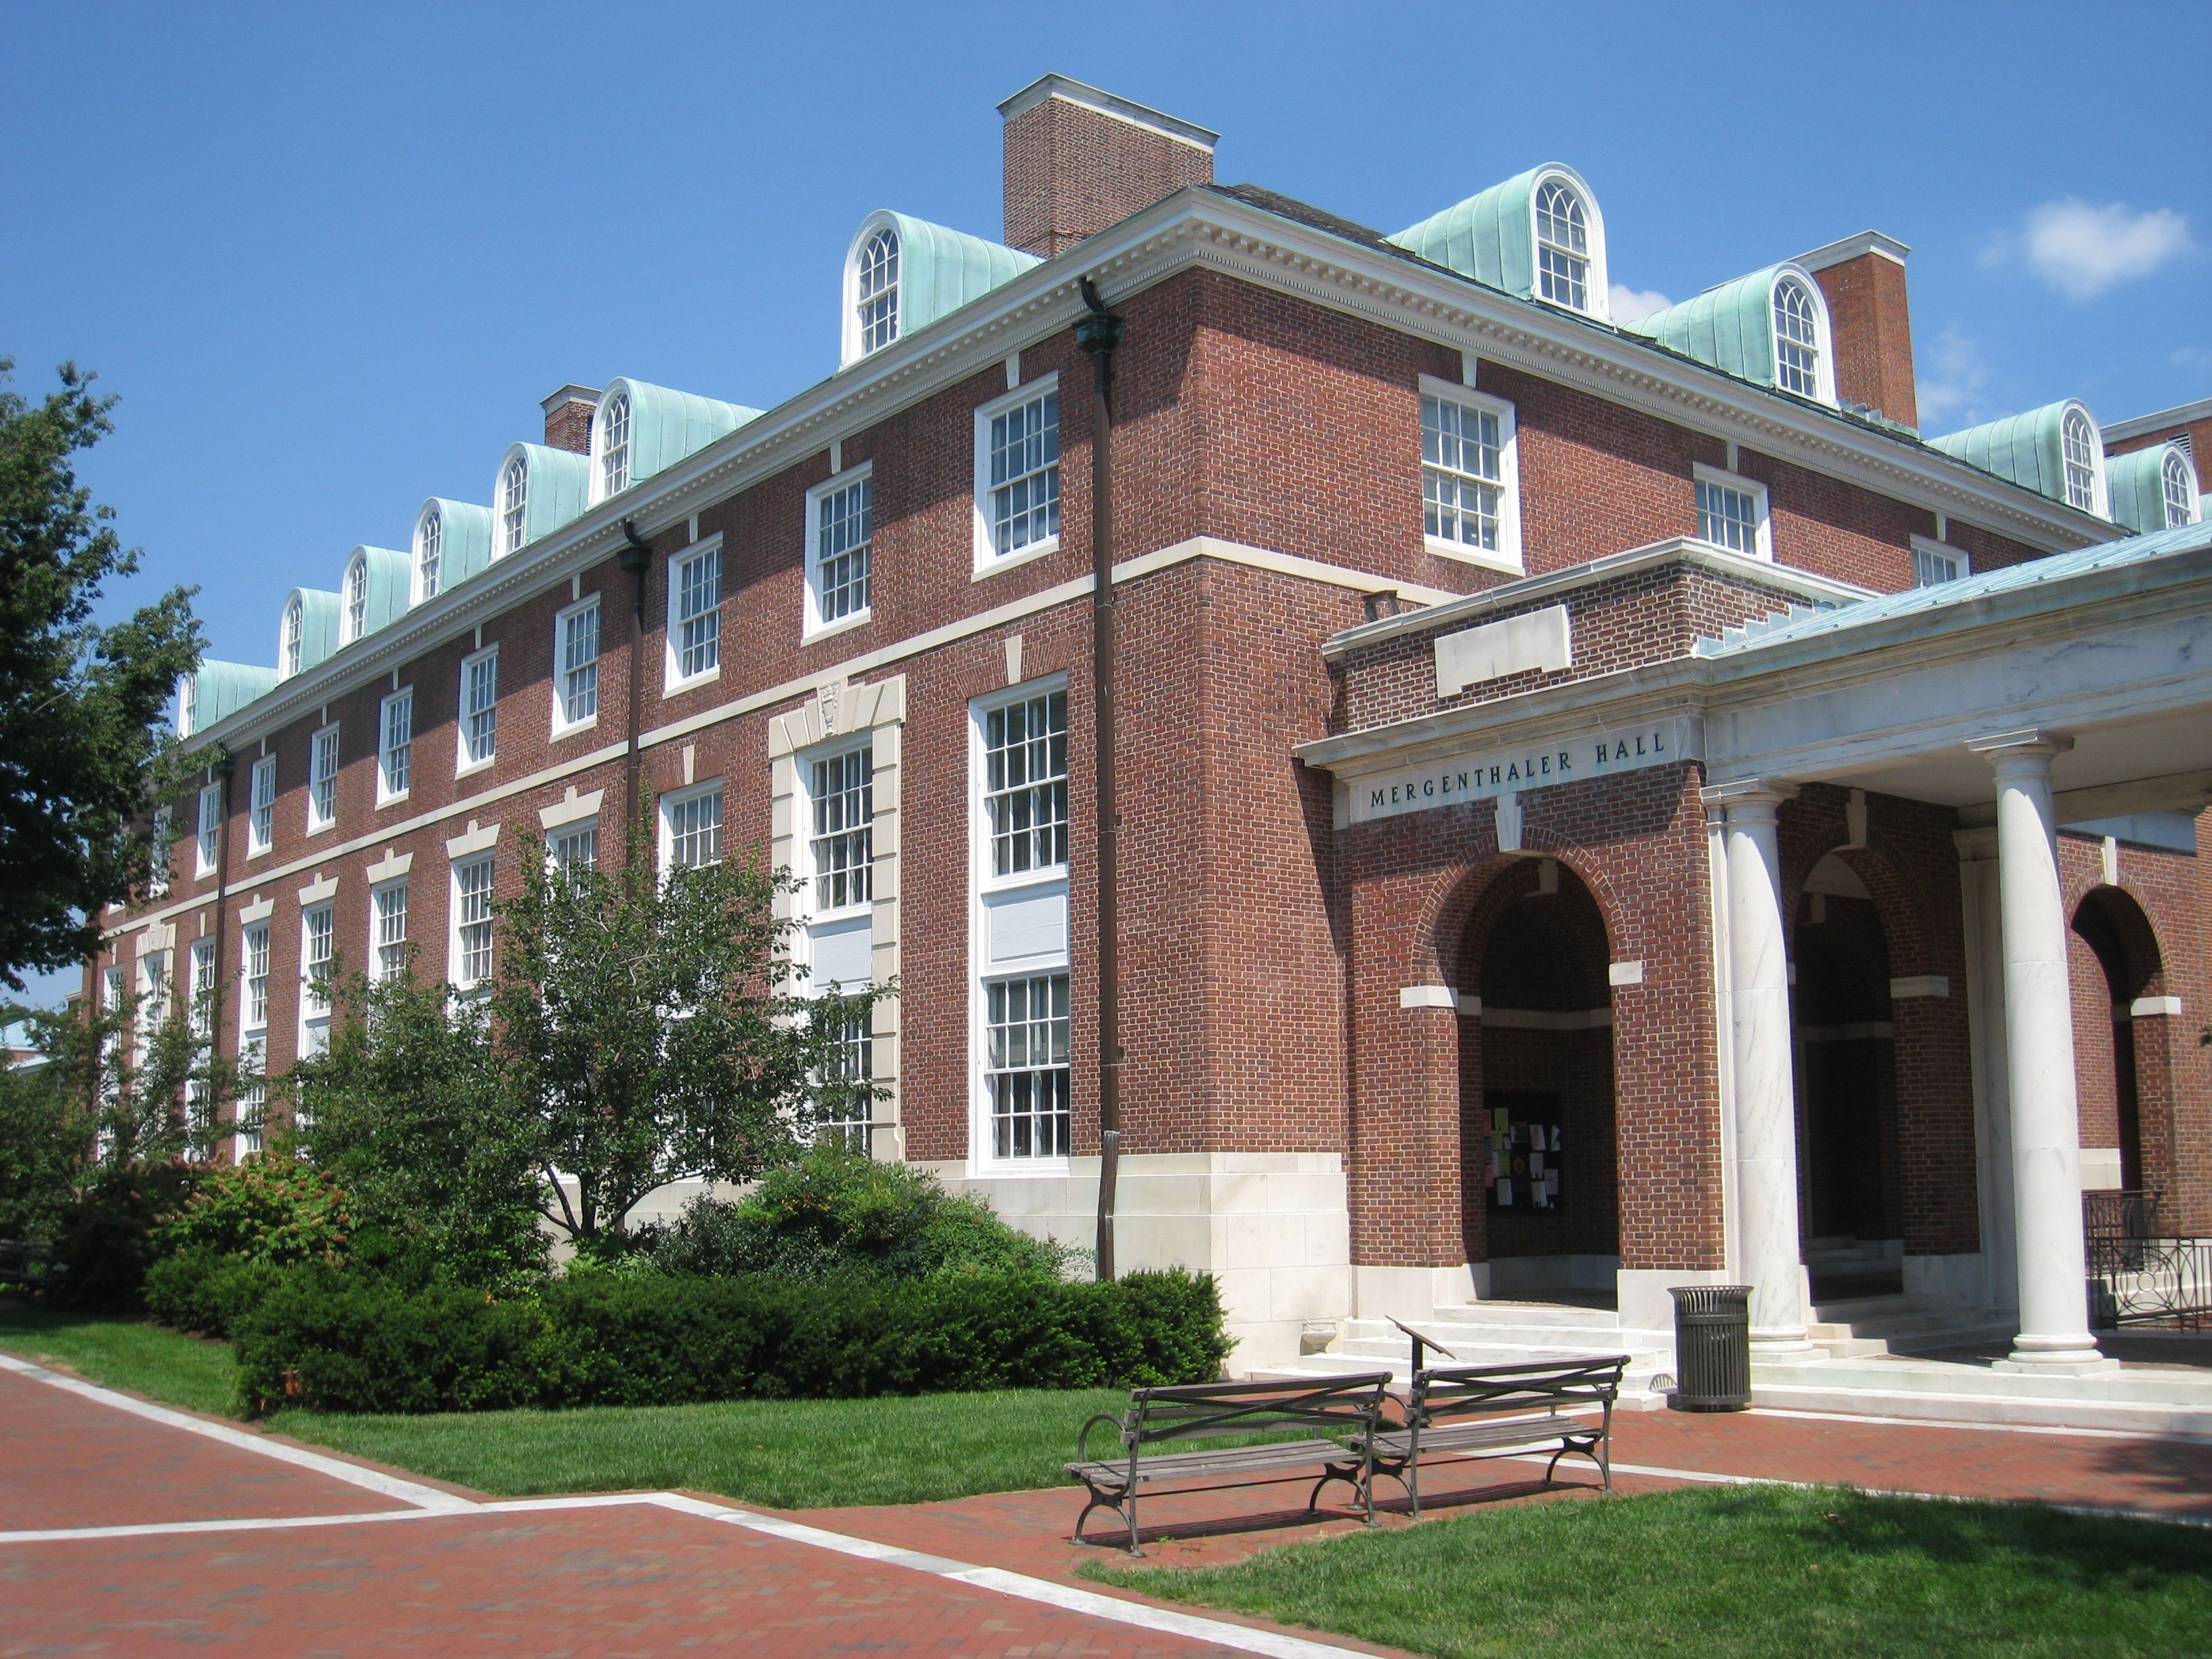 Johns Hopkins University?